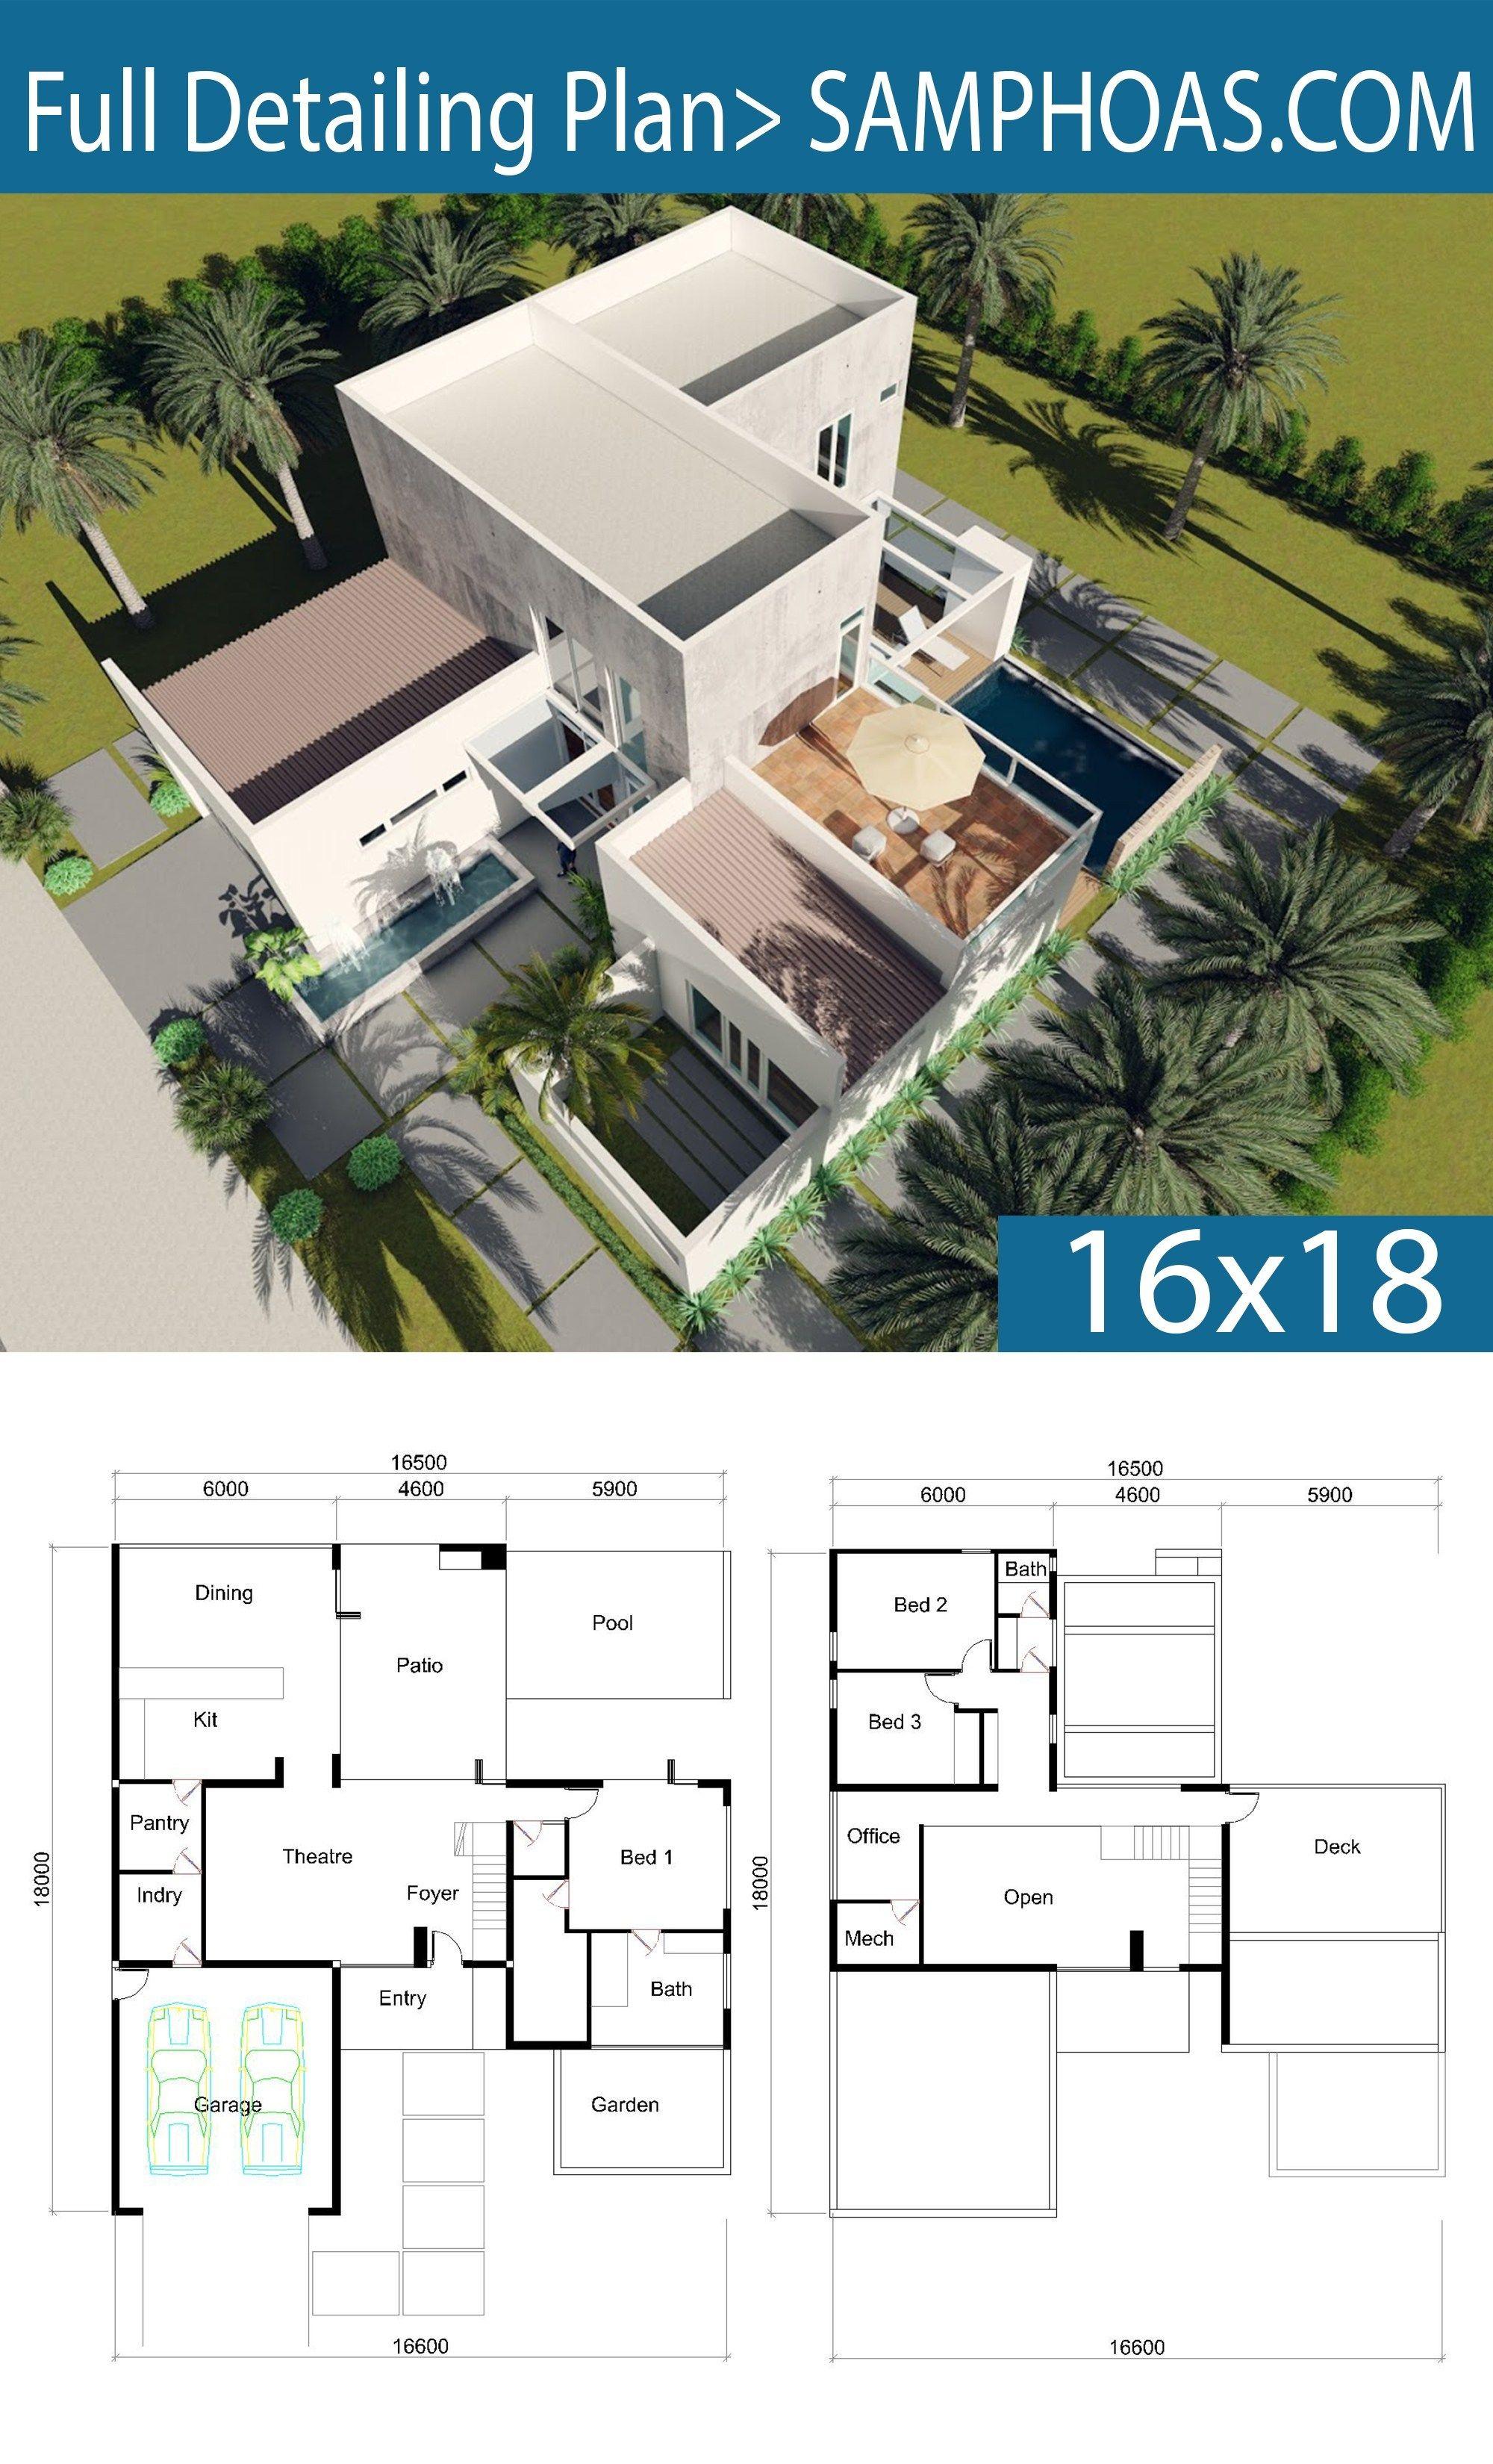 Villa De 3 Dormitorios Con Diseno 16x18m Samphoas Plan Villa Design Master Bedroom Interior Design How To Plan